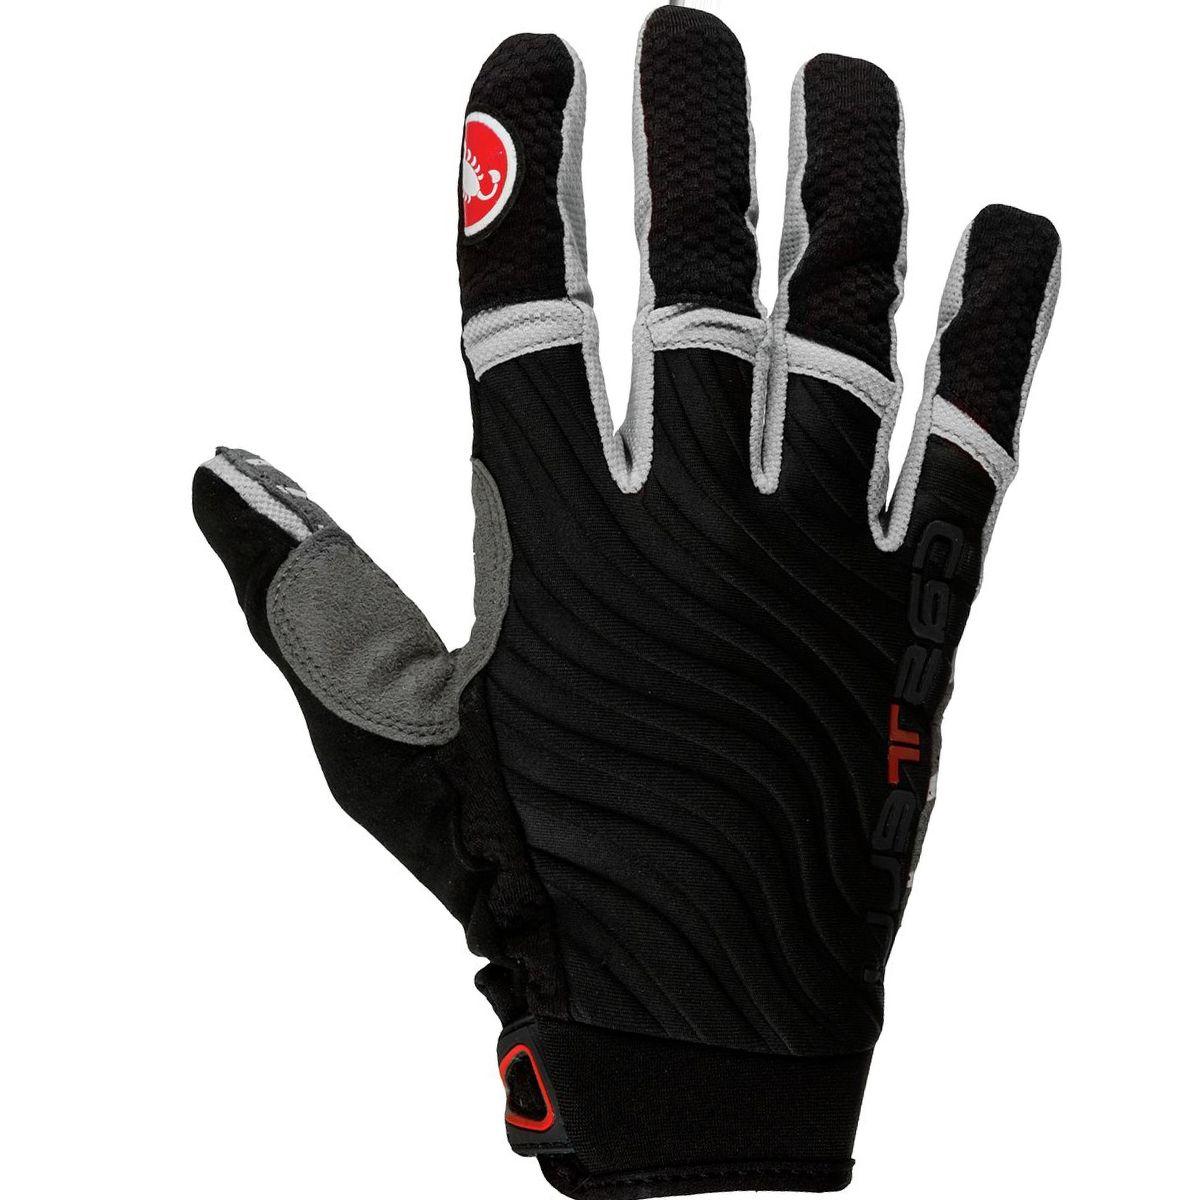 Castelli CW 6.0 Cross Glove - Men's